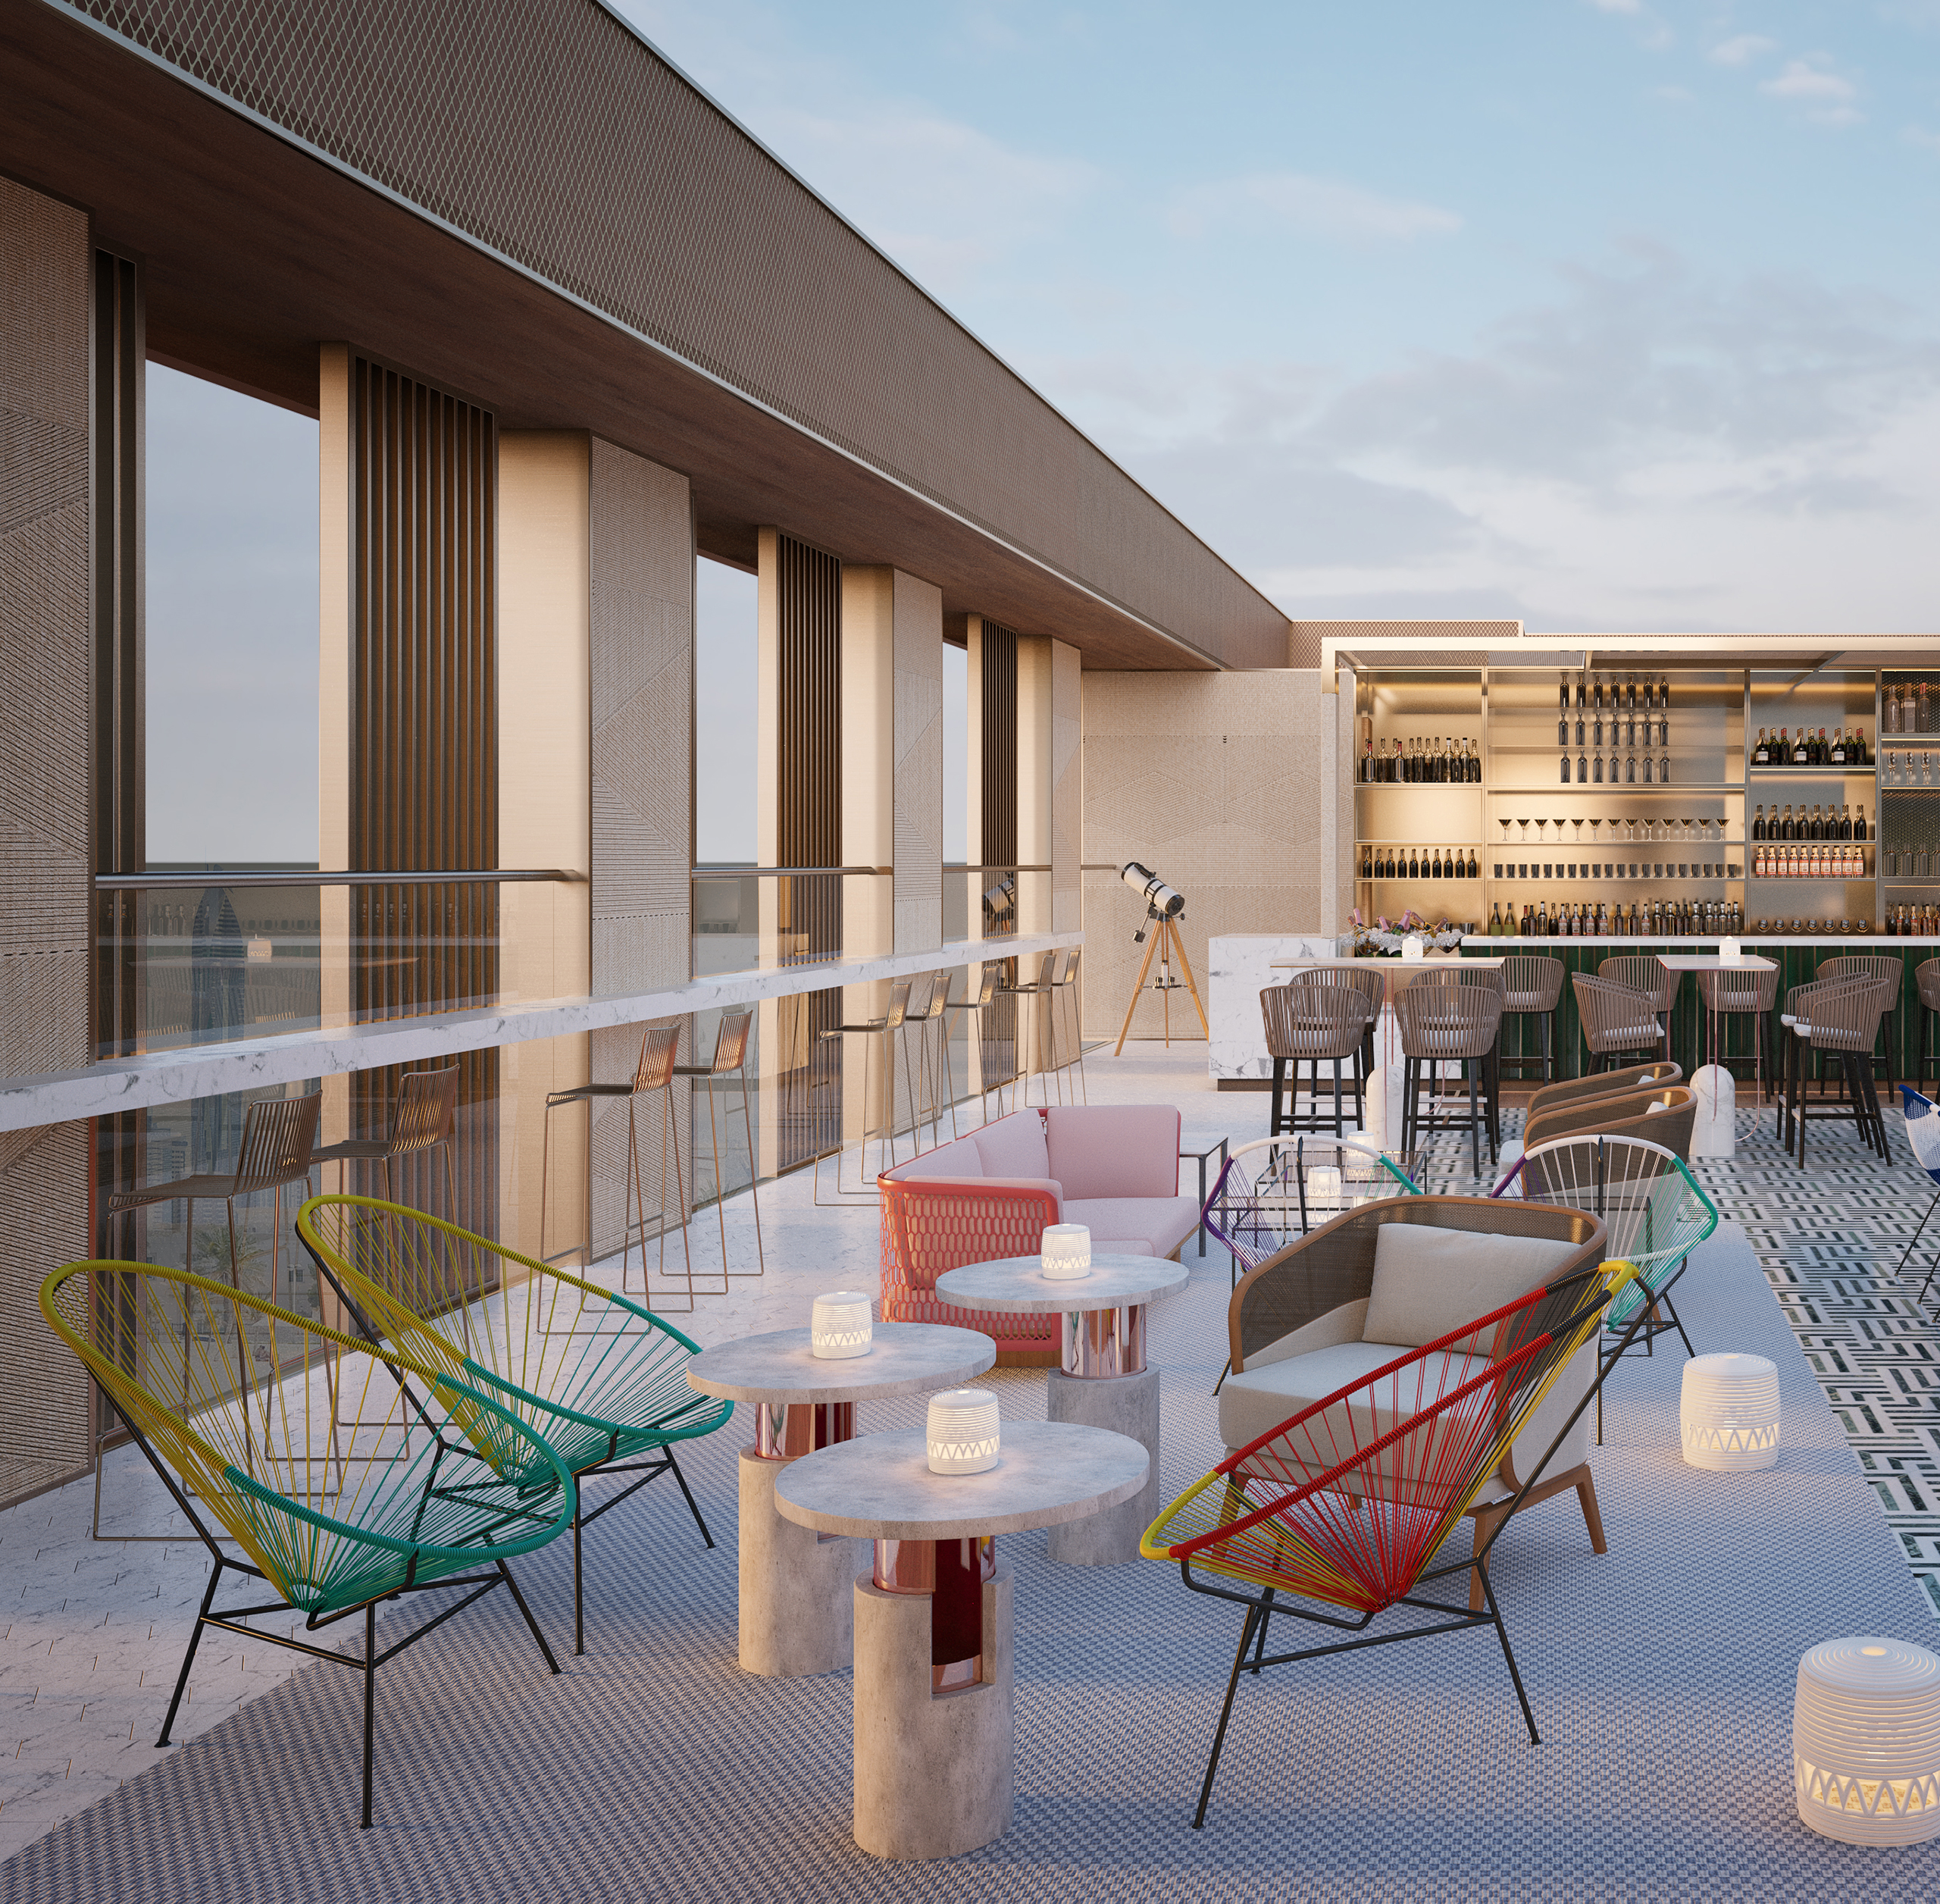 Hotel Andaz in Dubai